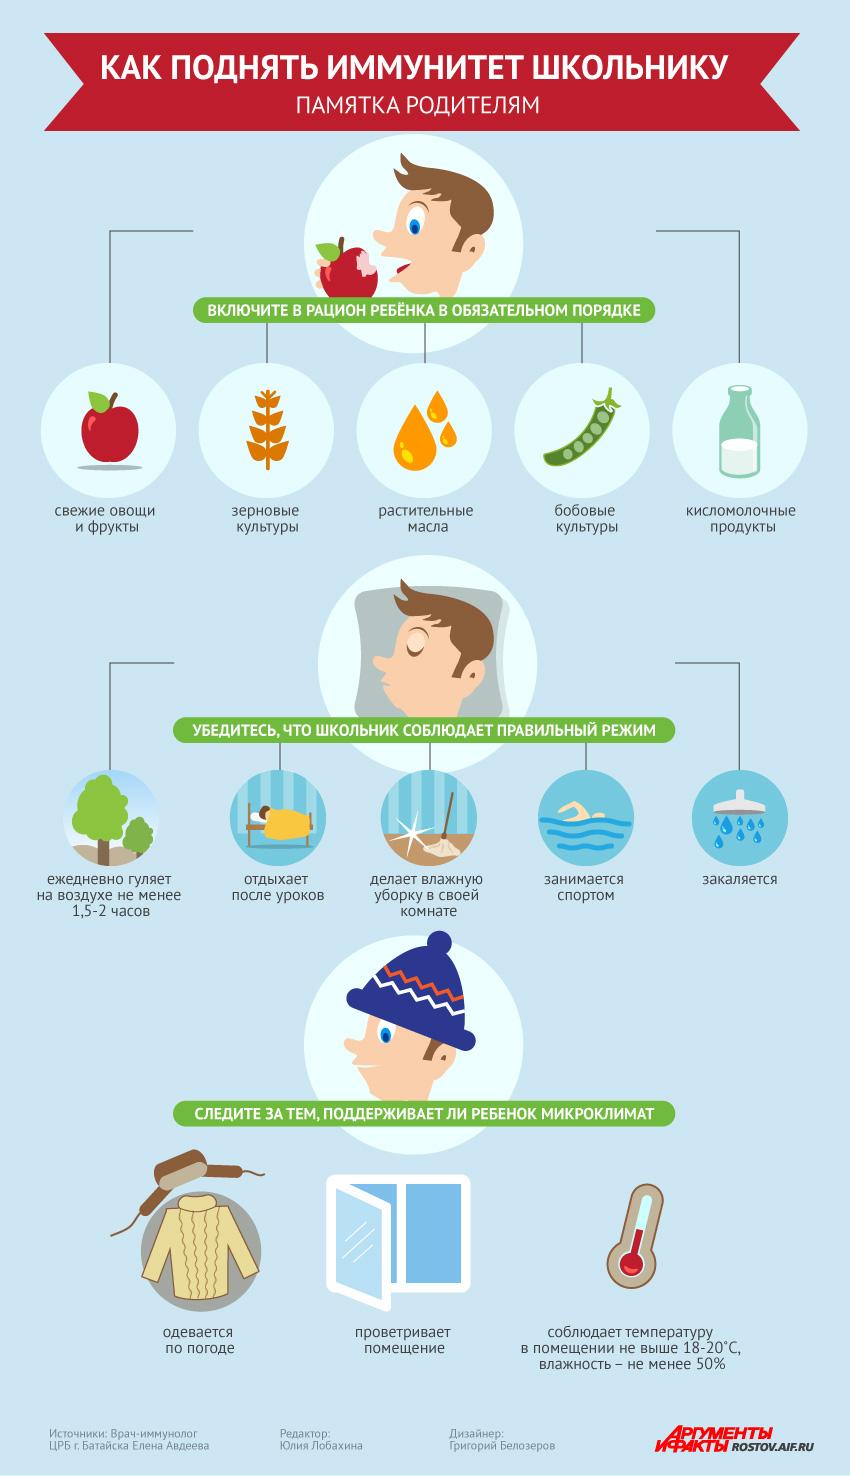 Иммунитет. Инфографика